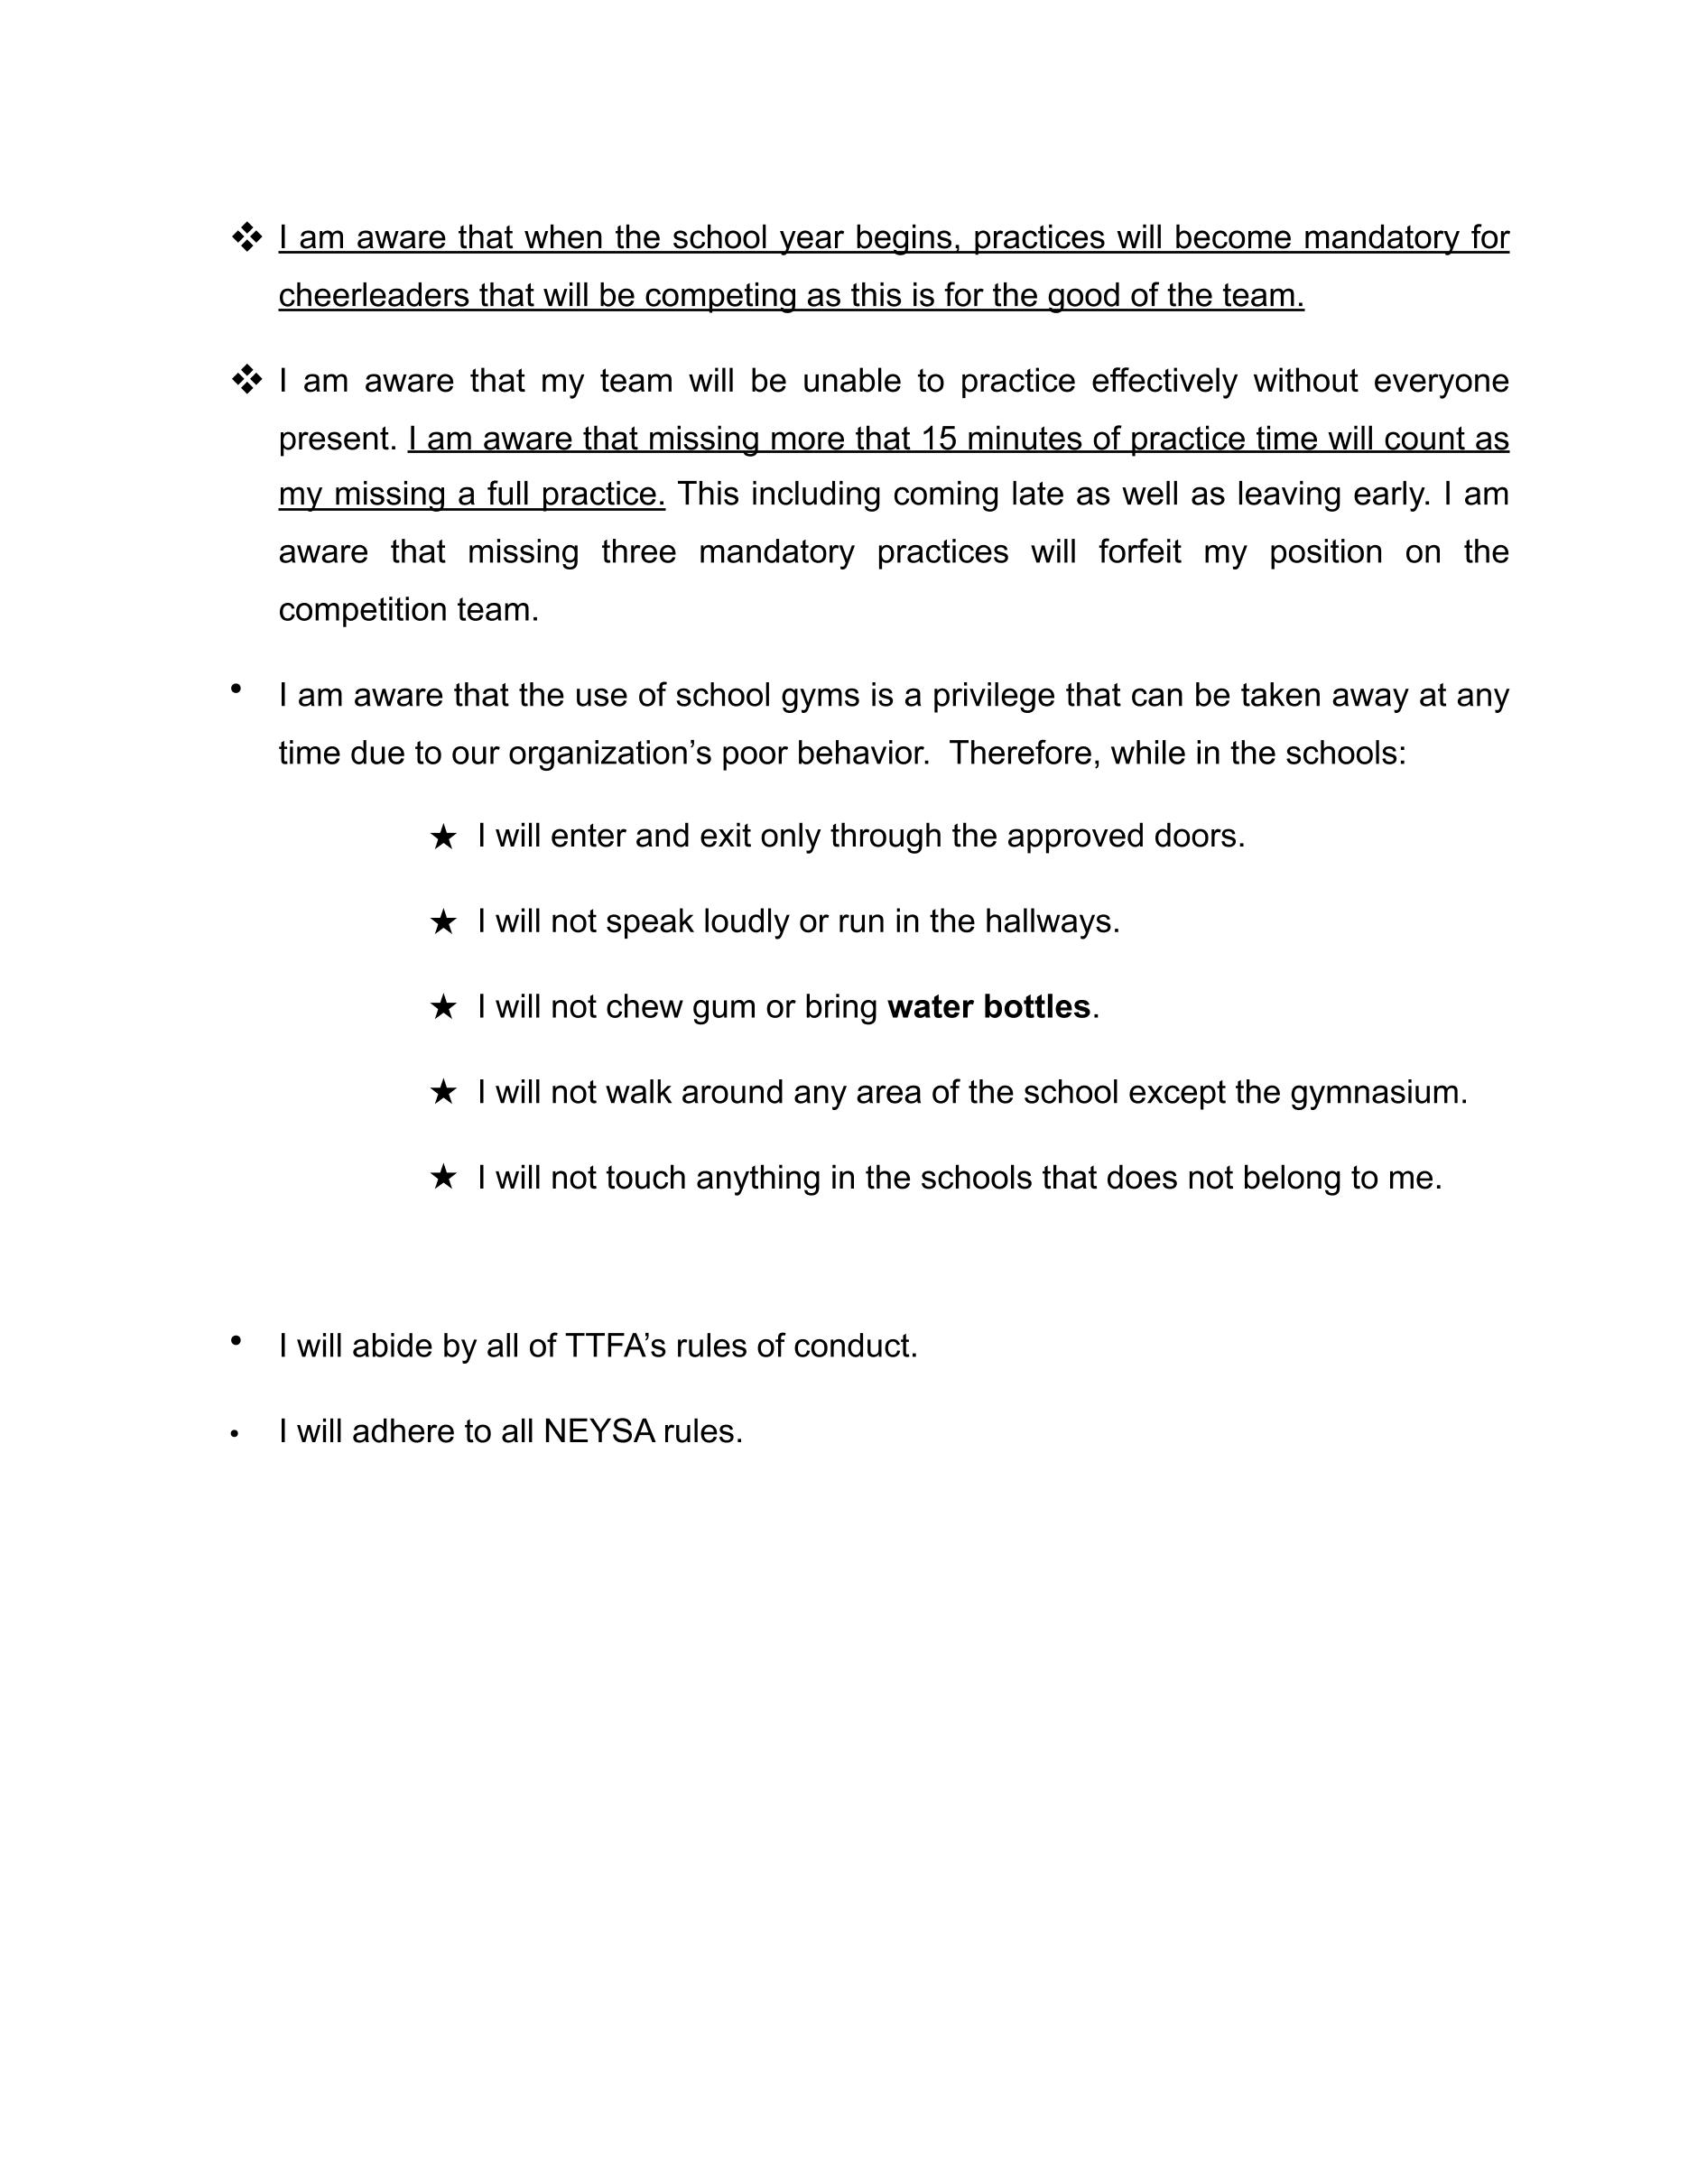 Cheerleading Code of Conduct #2